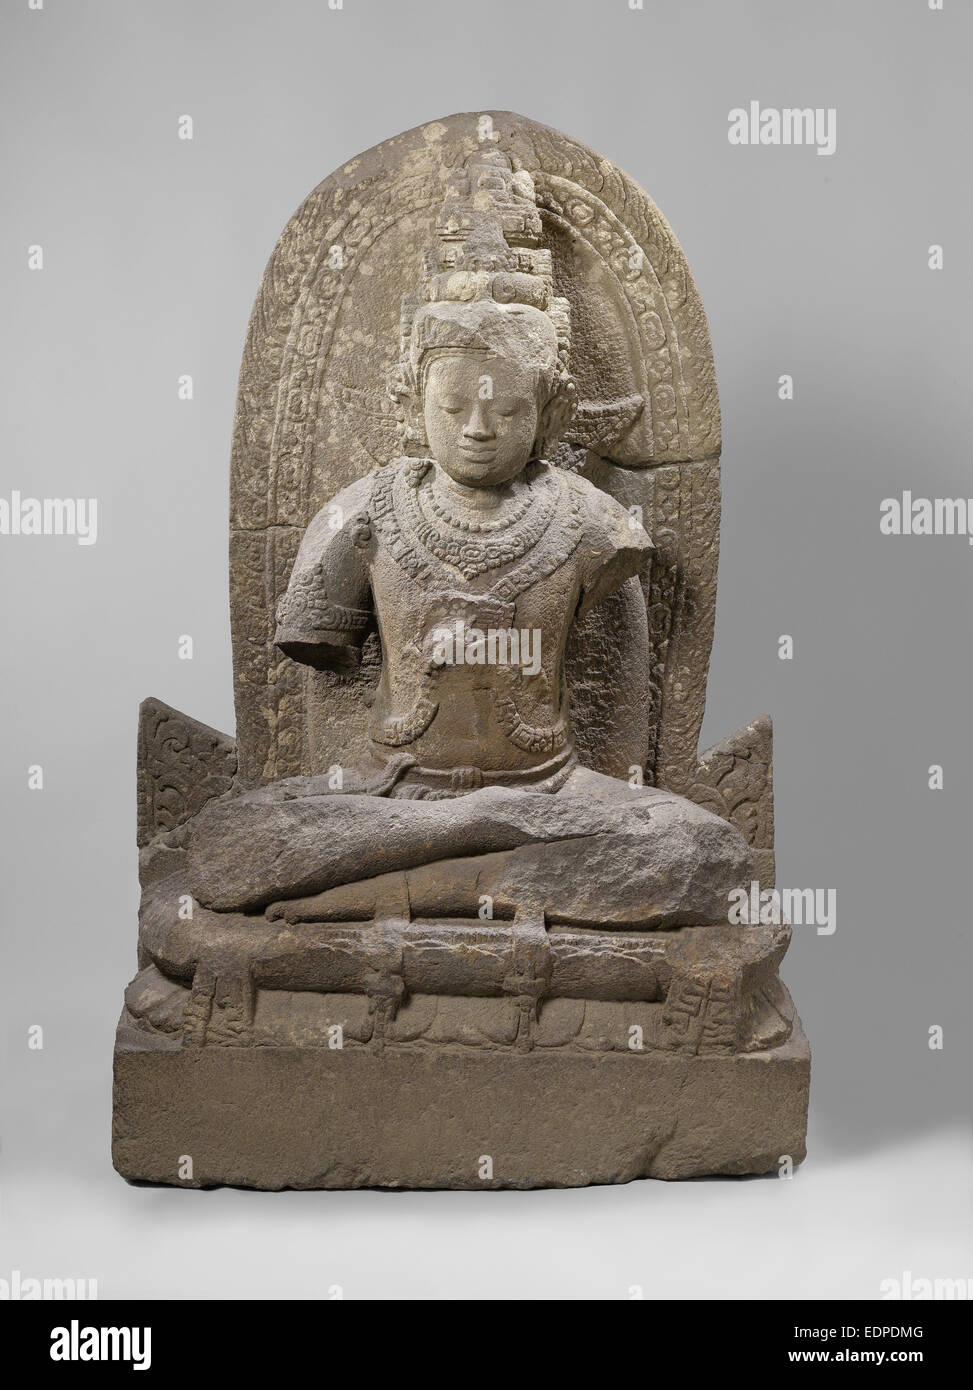 The bodhisattva Manjushri, Anonymous, c. 800 - c. 900 - Stock Image